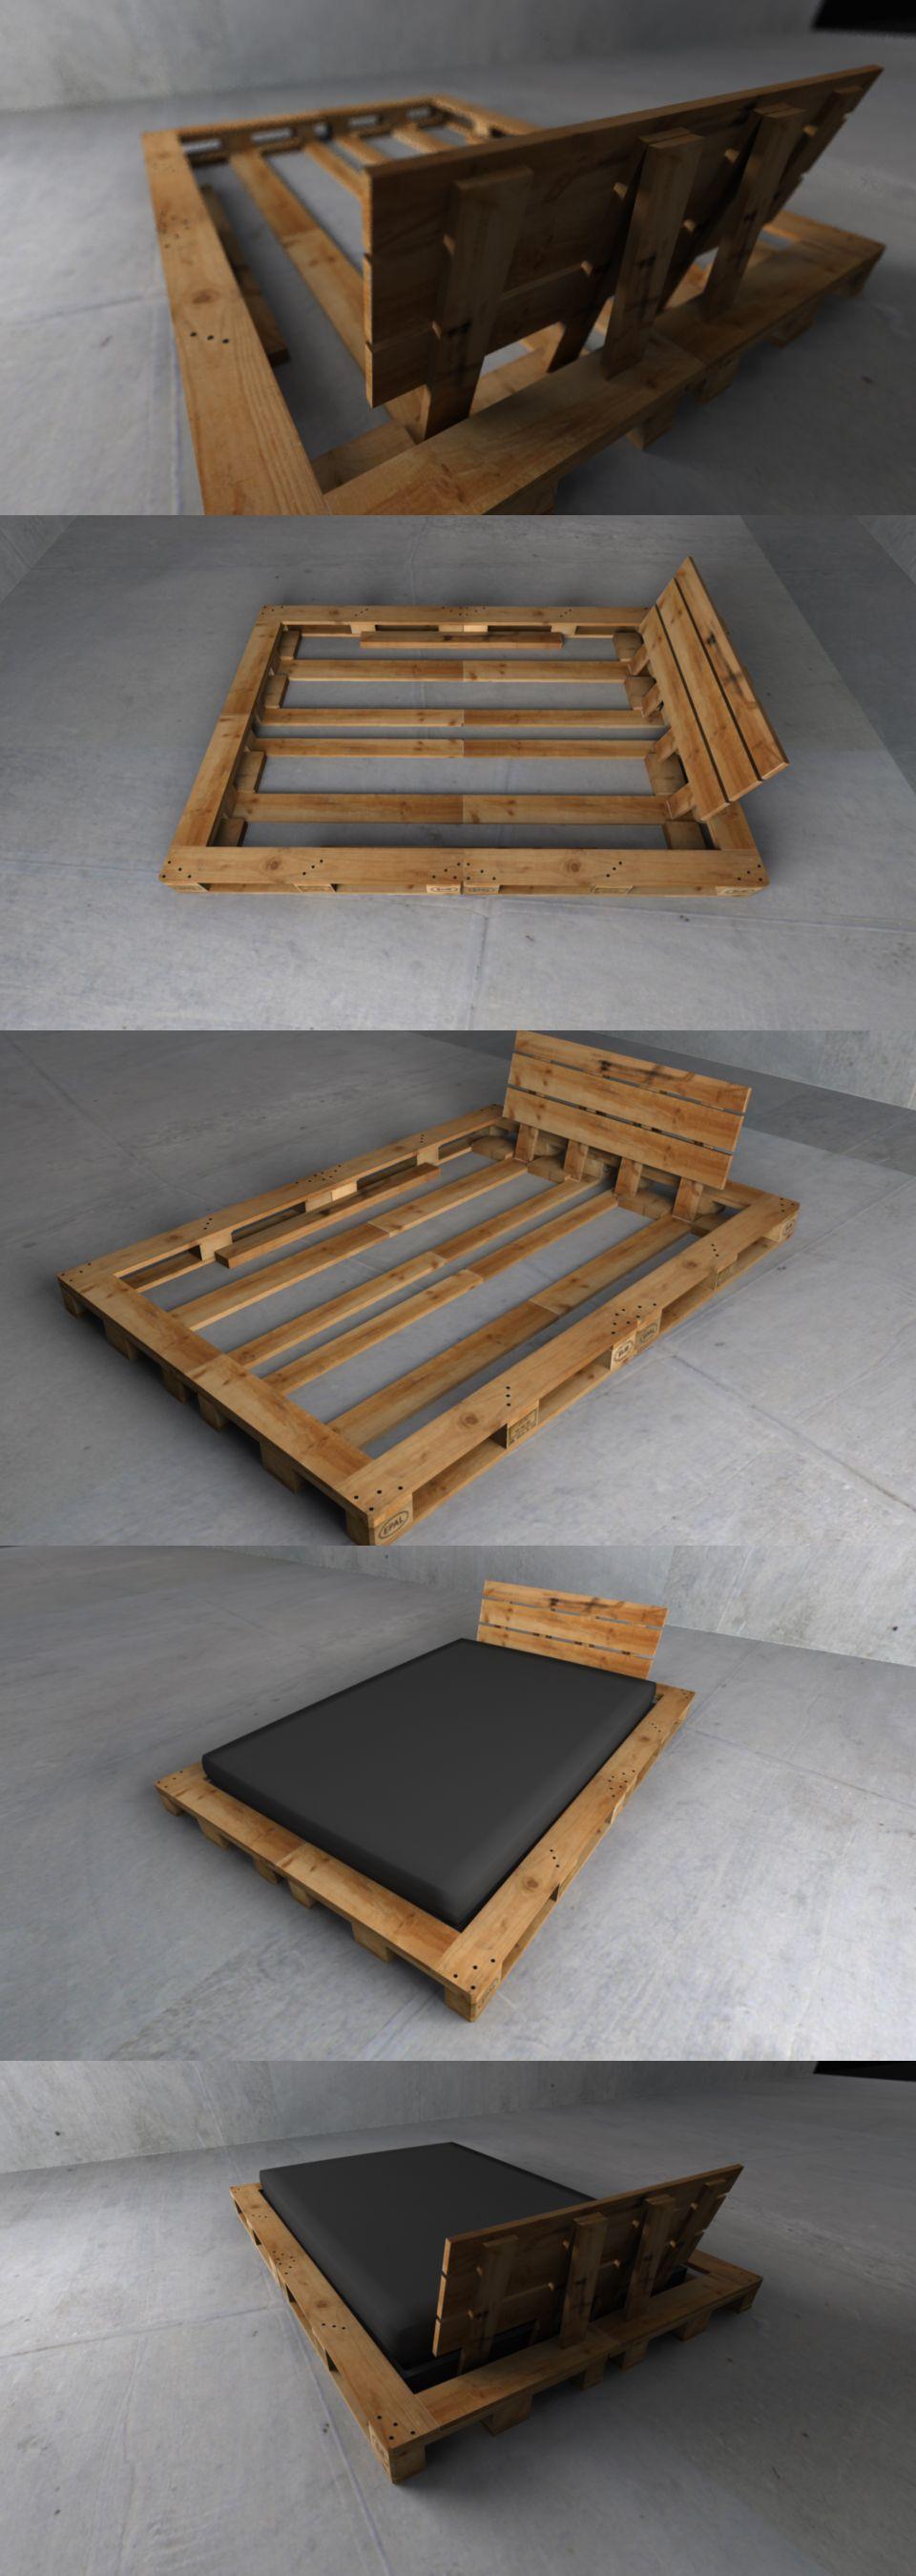 Http Www Bkgfactory Com Category Bed Frame Vier Europaletten